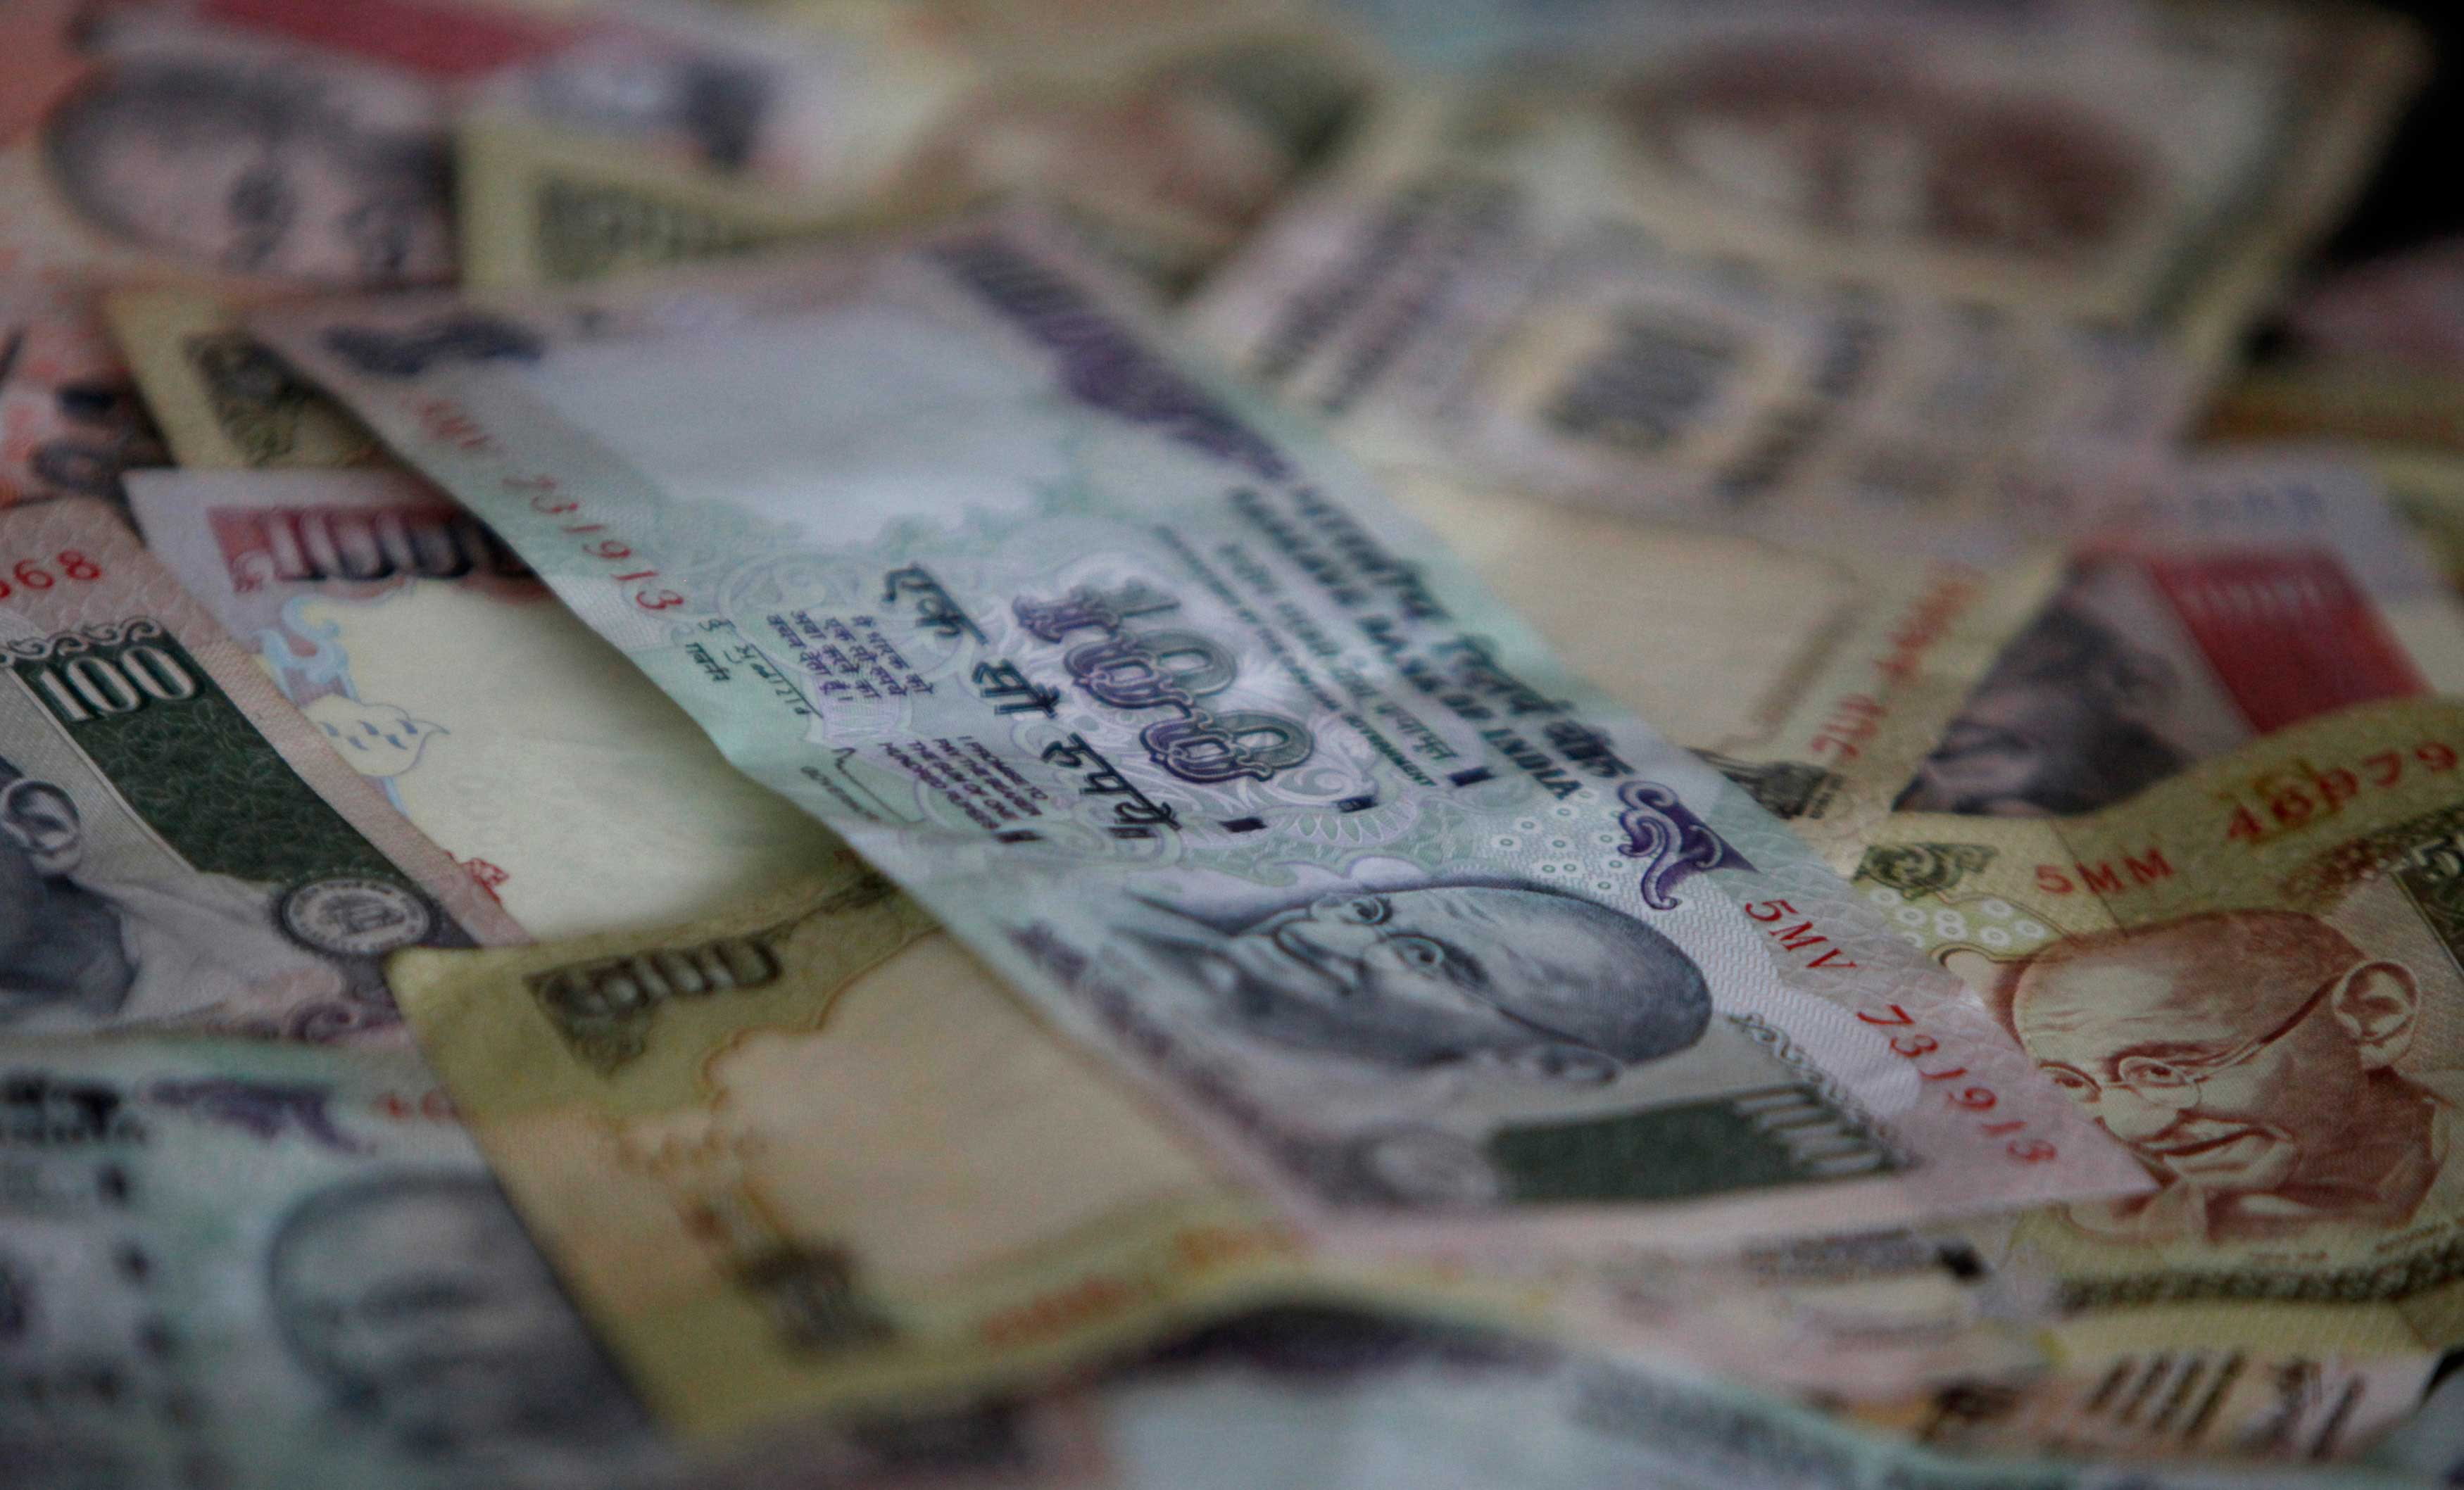 India home to 200K millionaires